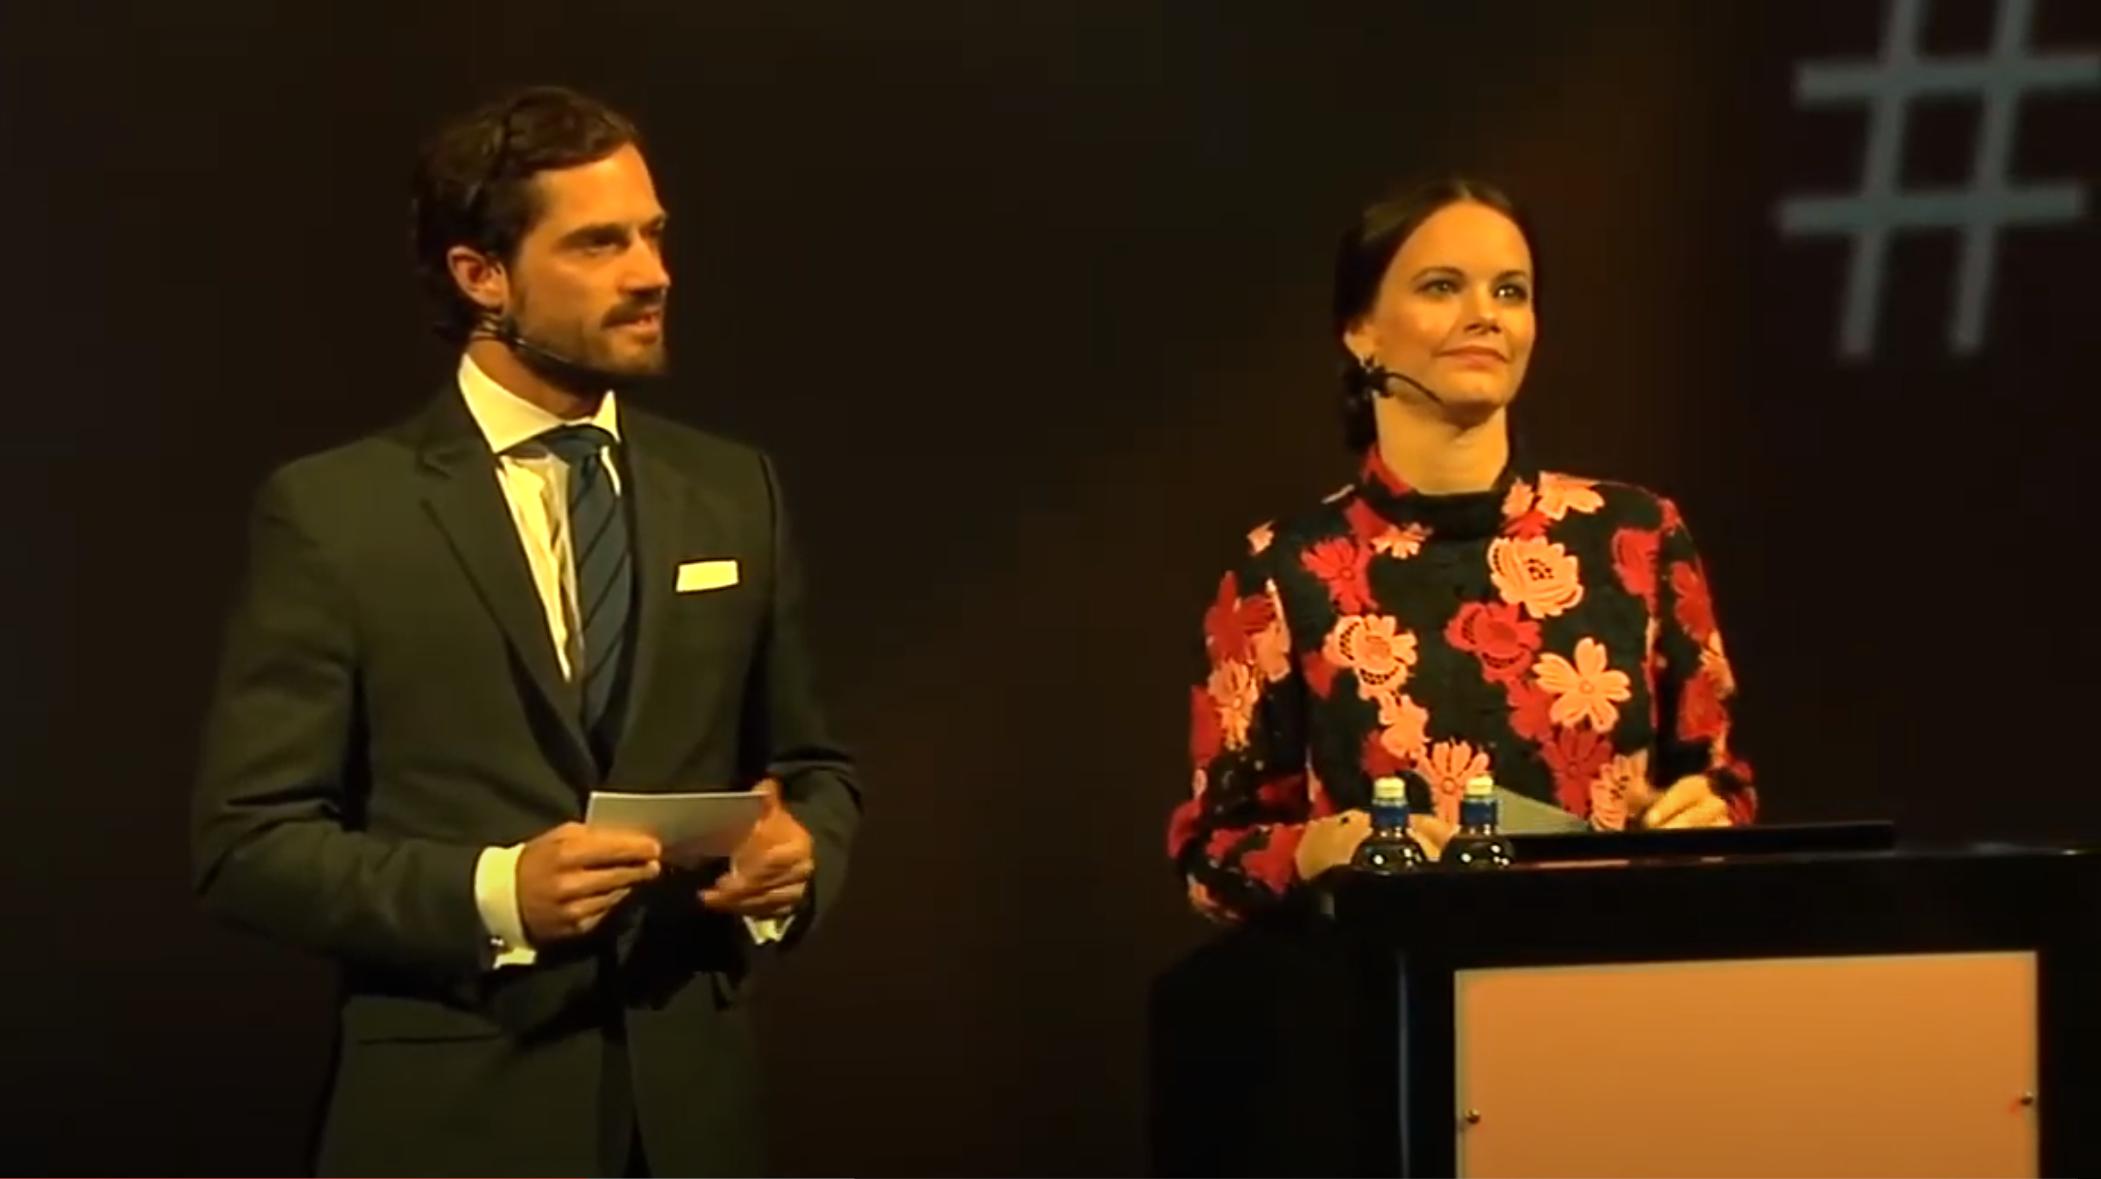 H.R.H. Prince Carl Philip & H.R.H. Princess Sofia WABF 2017 Keynote Speakers